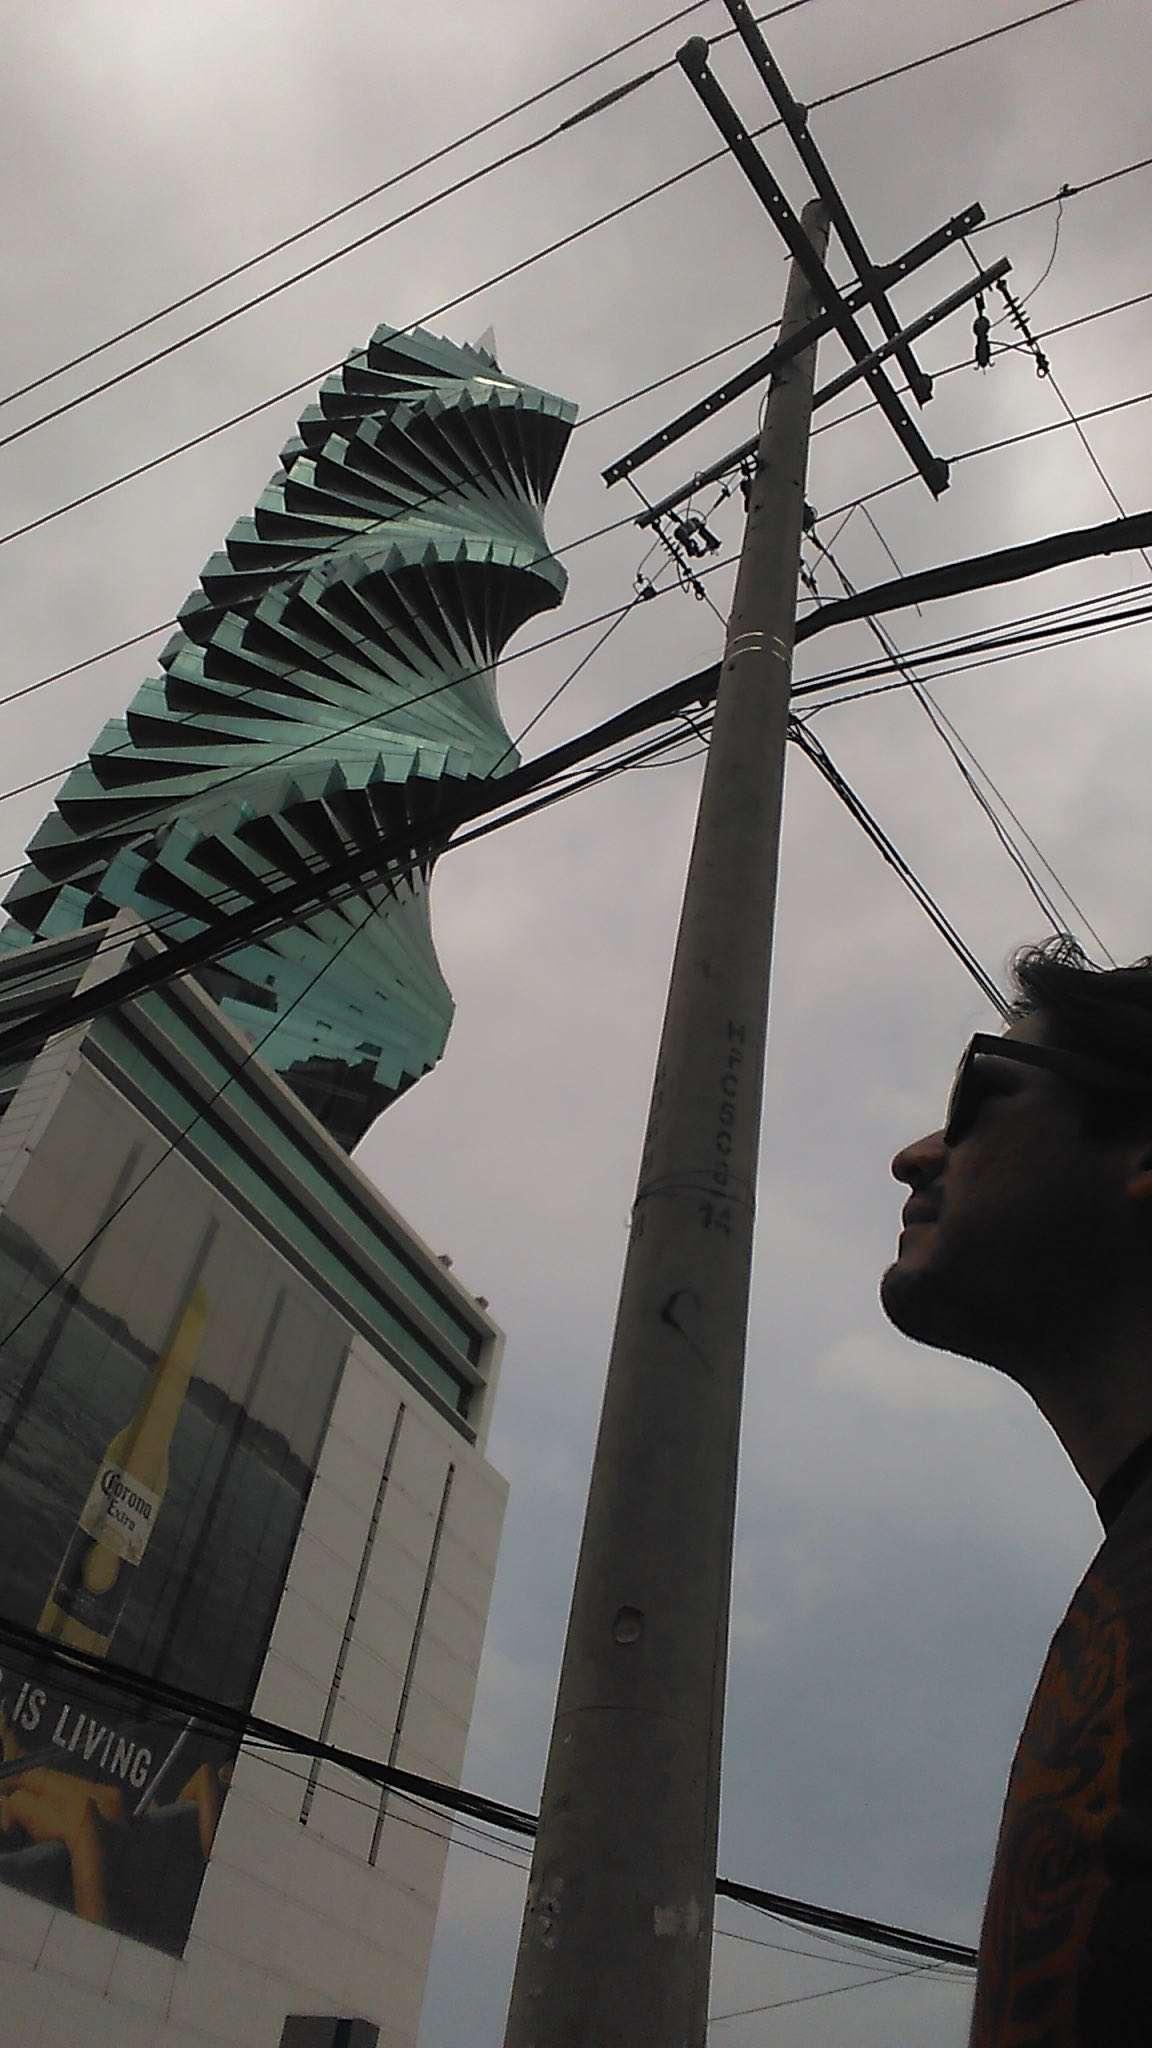 cocotu panama fandf tower